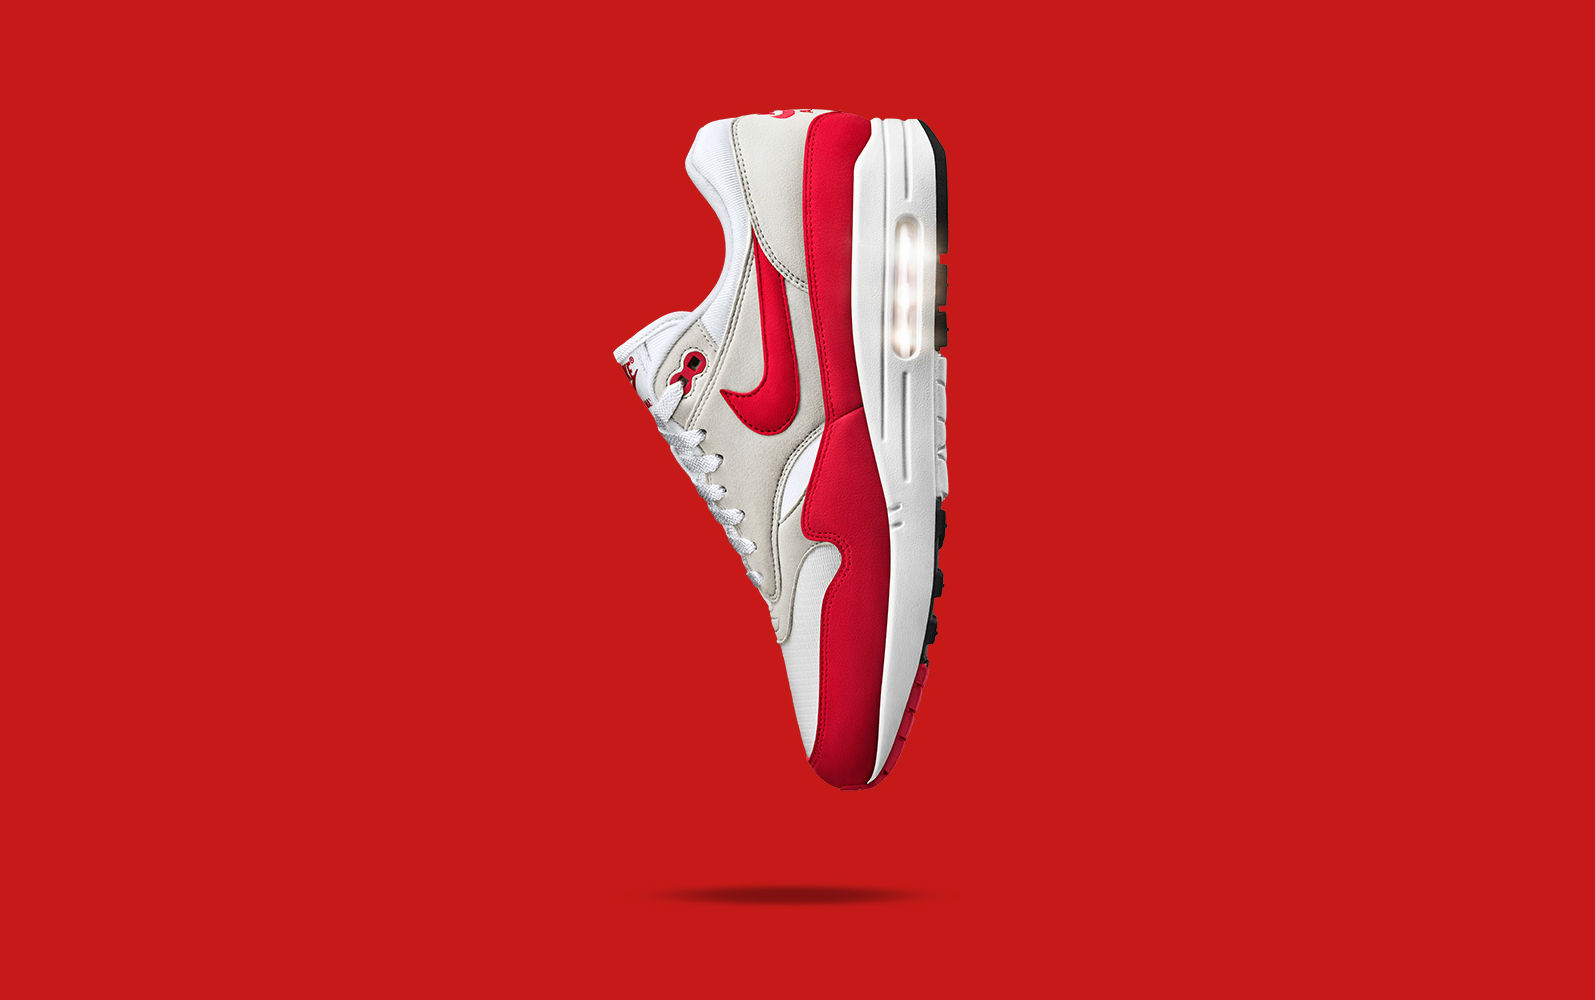 Restock Nike Air Max 1 OG Anniversary Red - Le Site de la Sneaker